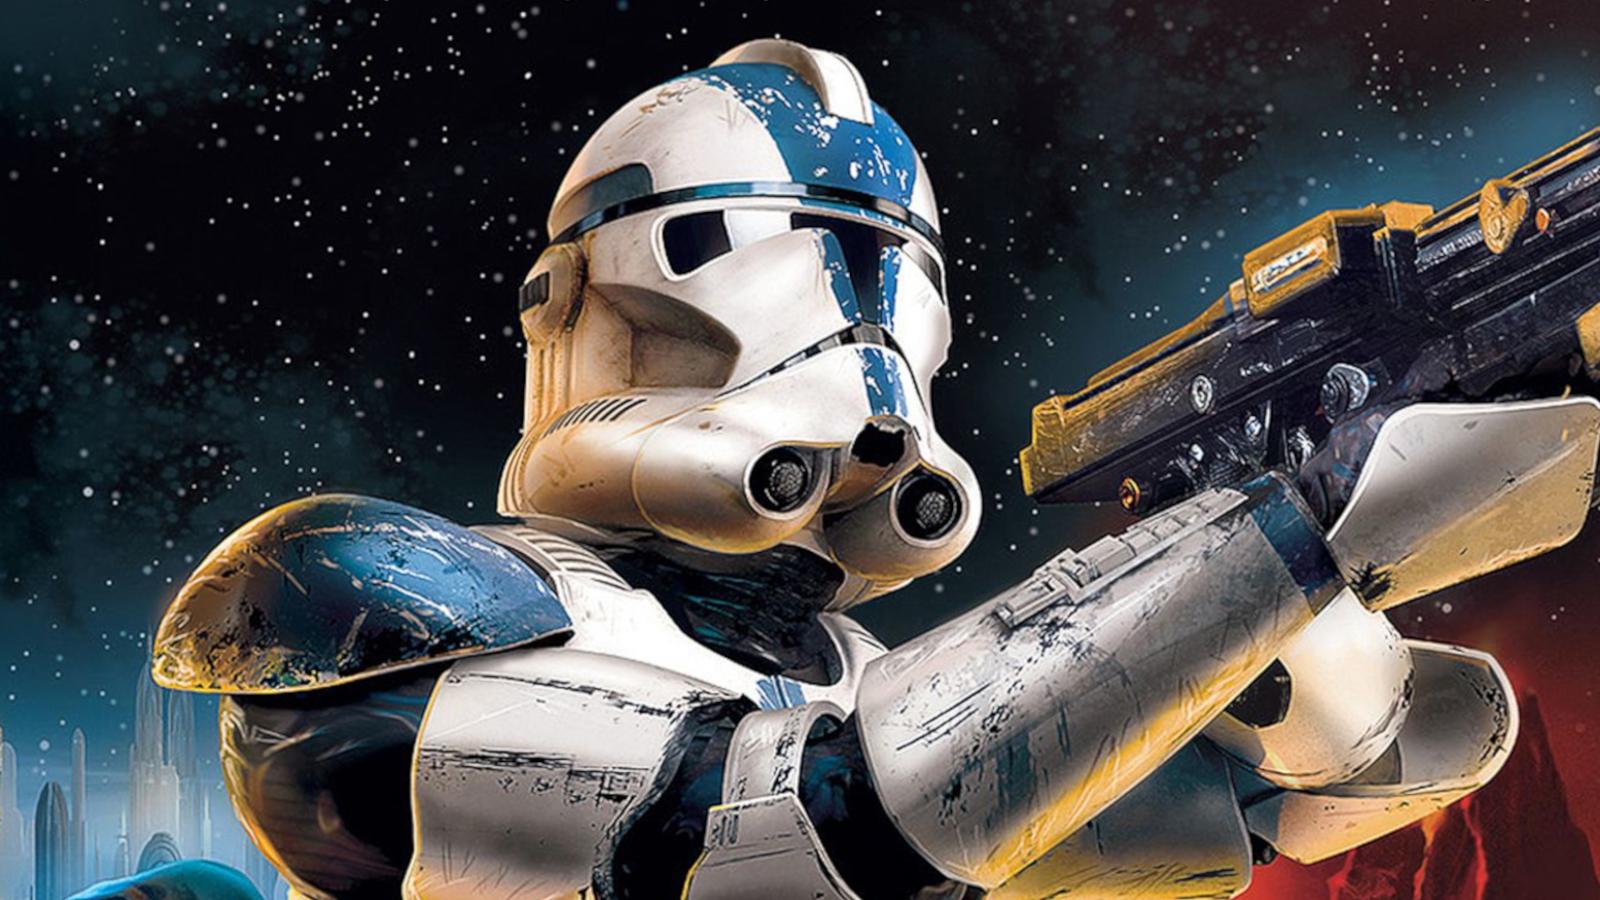 Key art for Star Wars Battlefront II